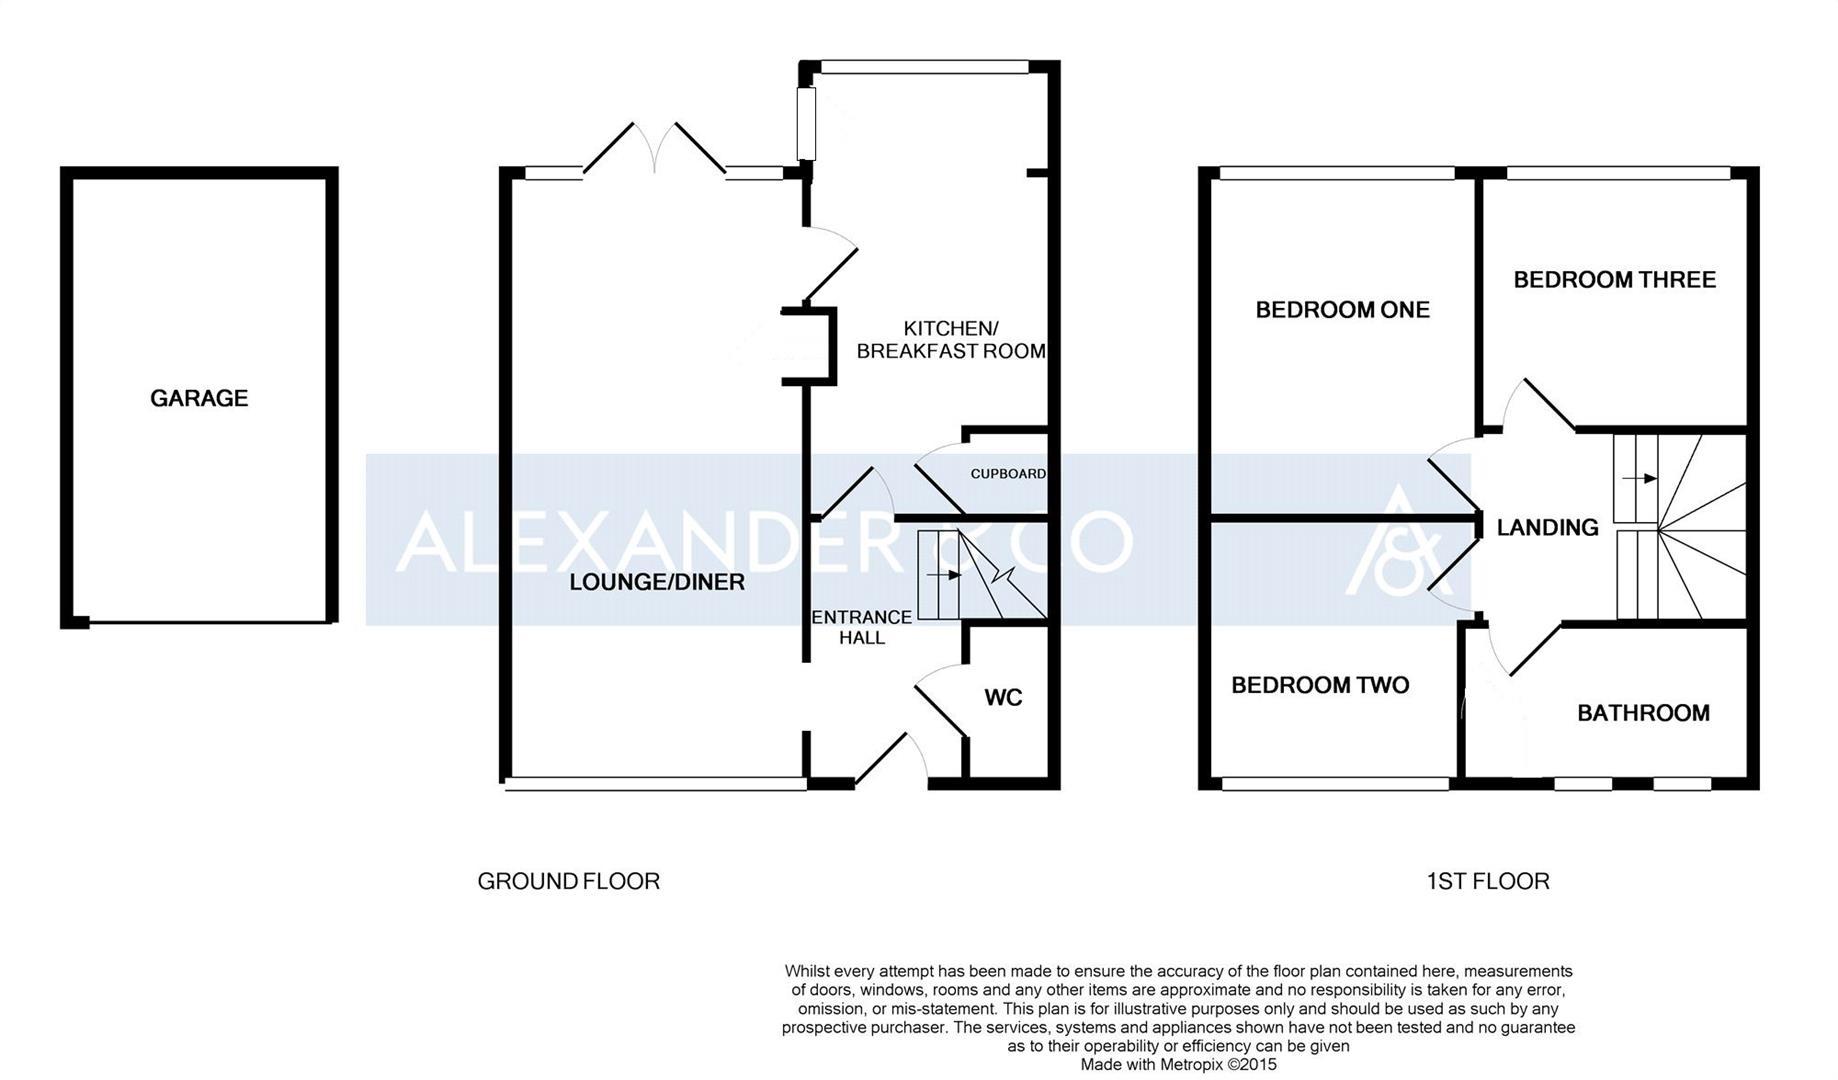 london road dunstable lu6 3 bedroom detached house for sale